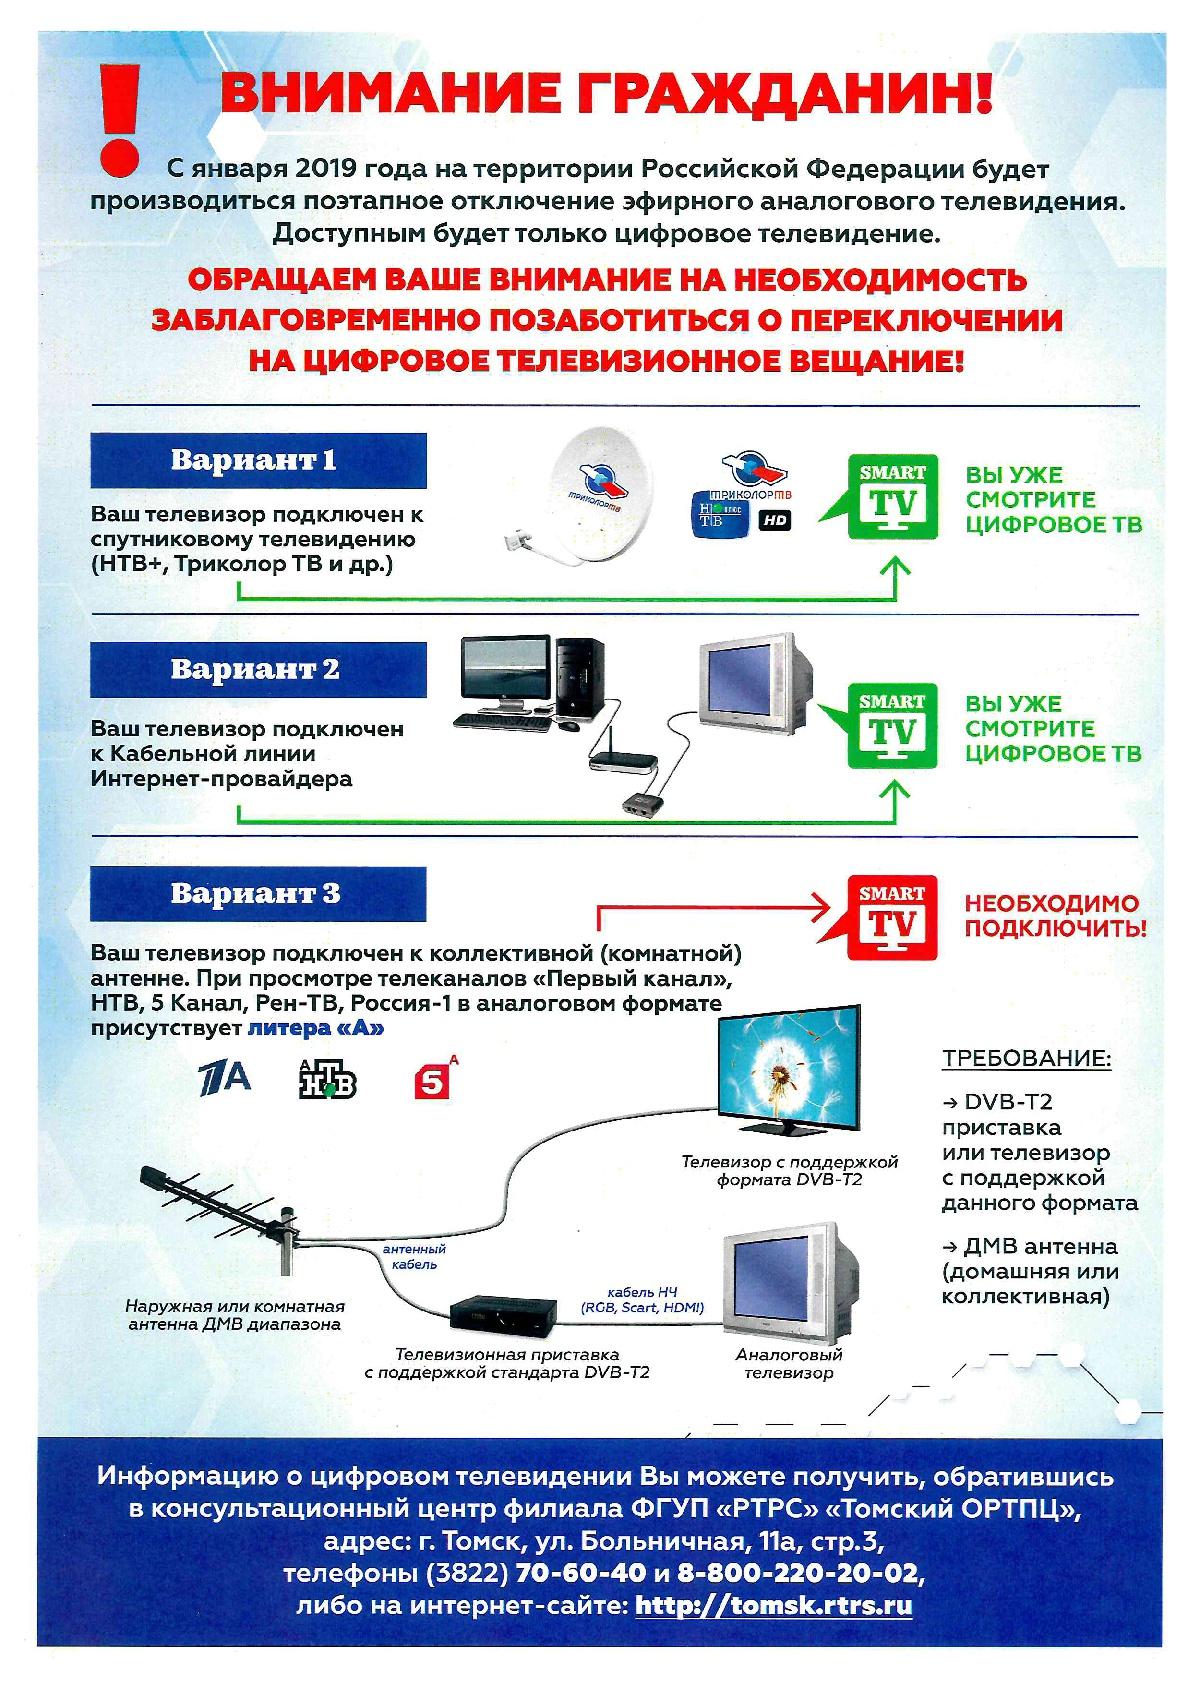 Цифровое тв-001